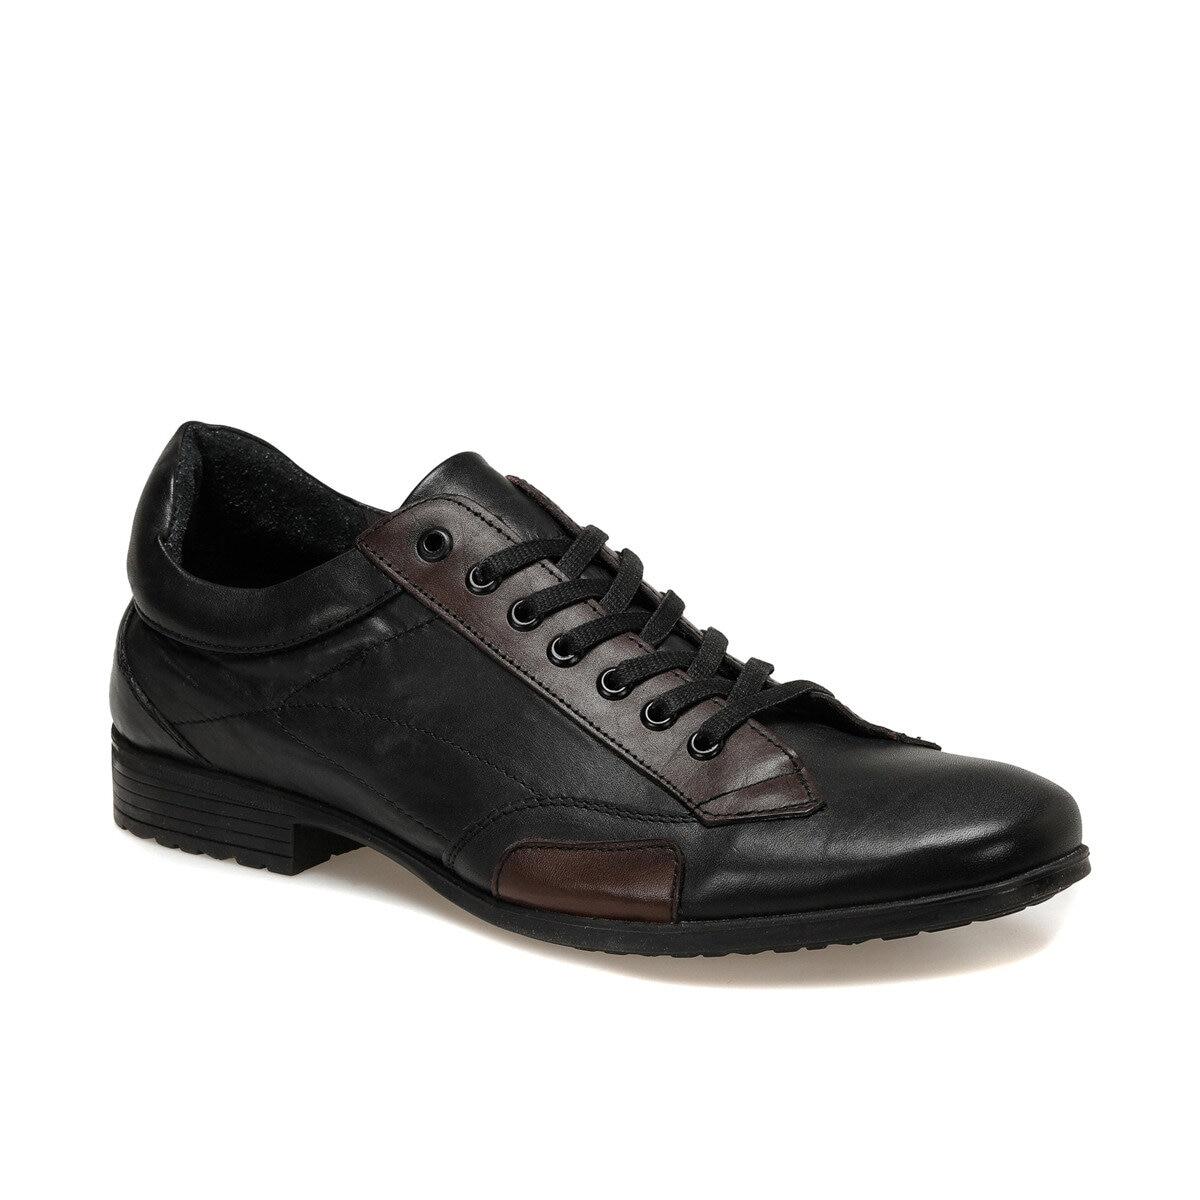 FLO 8000-1531 Black Male Shoes Oxide